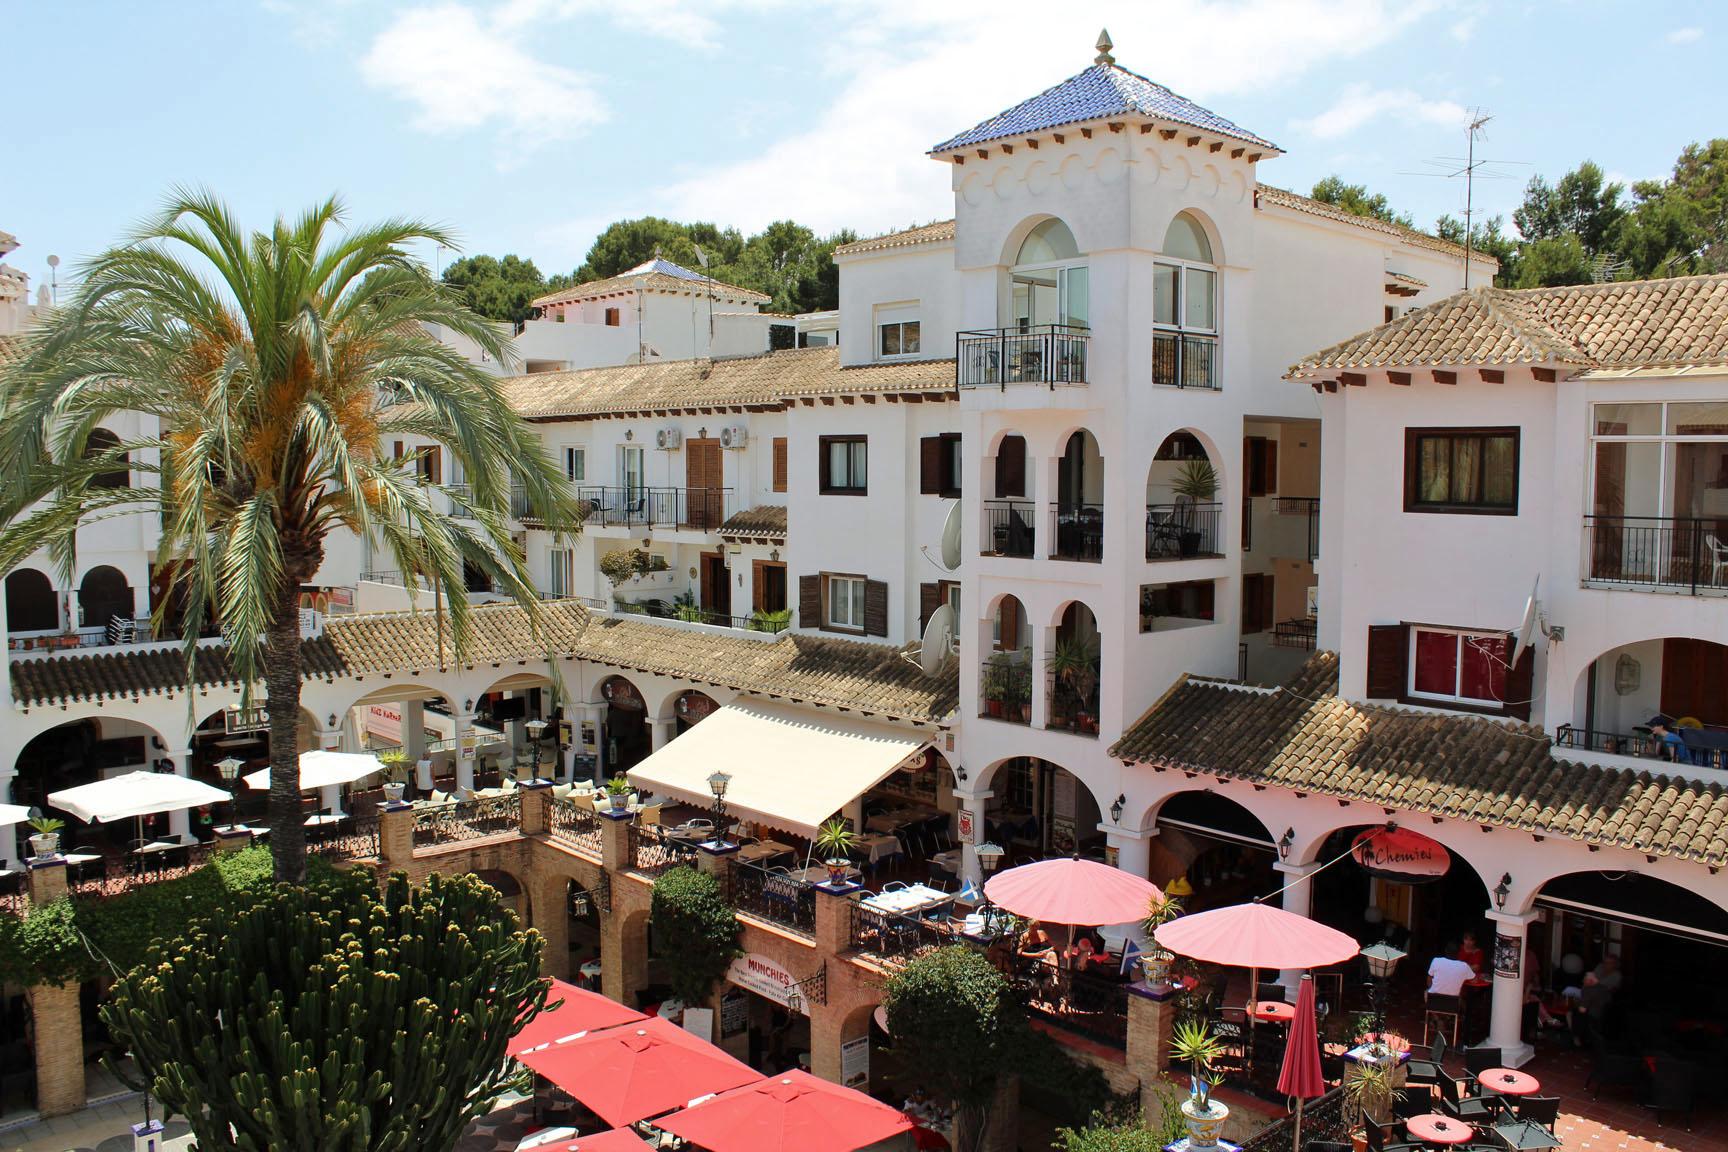 ITSH Property Views over the Villamartin Plaza 11